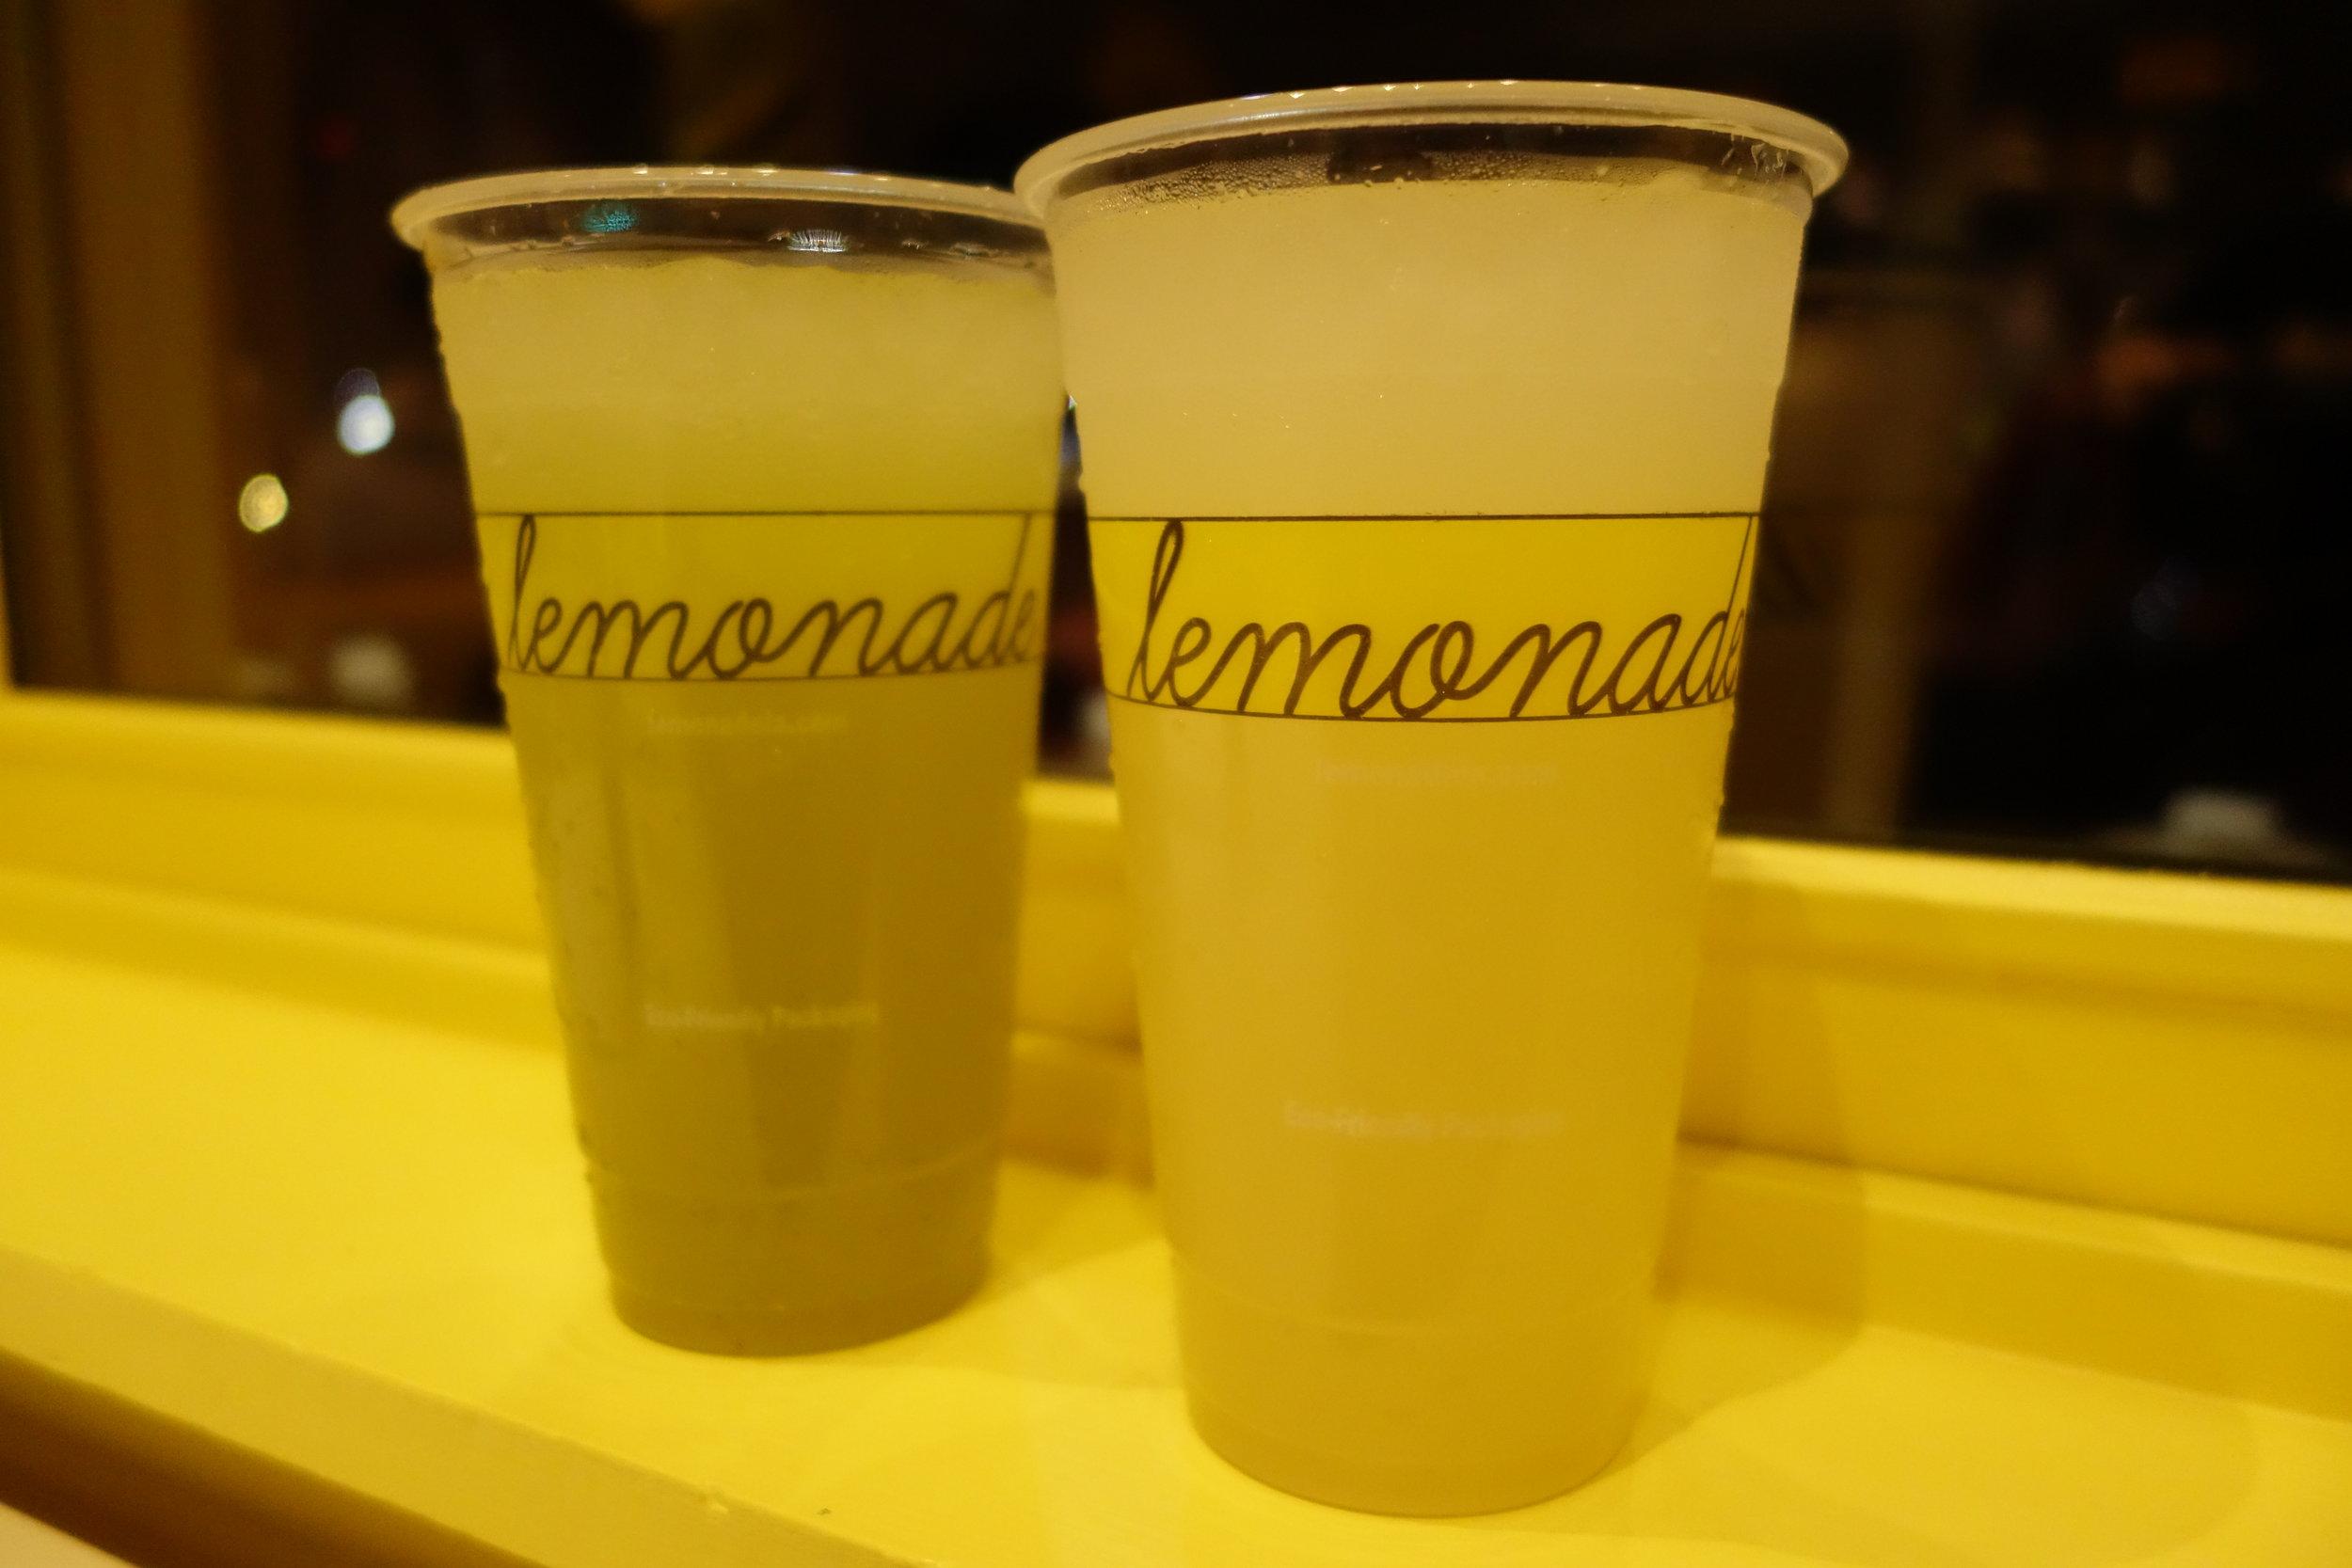 lemonade-walnut-creek-la-restaurant-sandybythebay-sffoodphotography (91).JPG